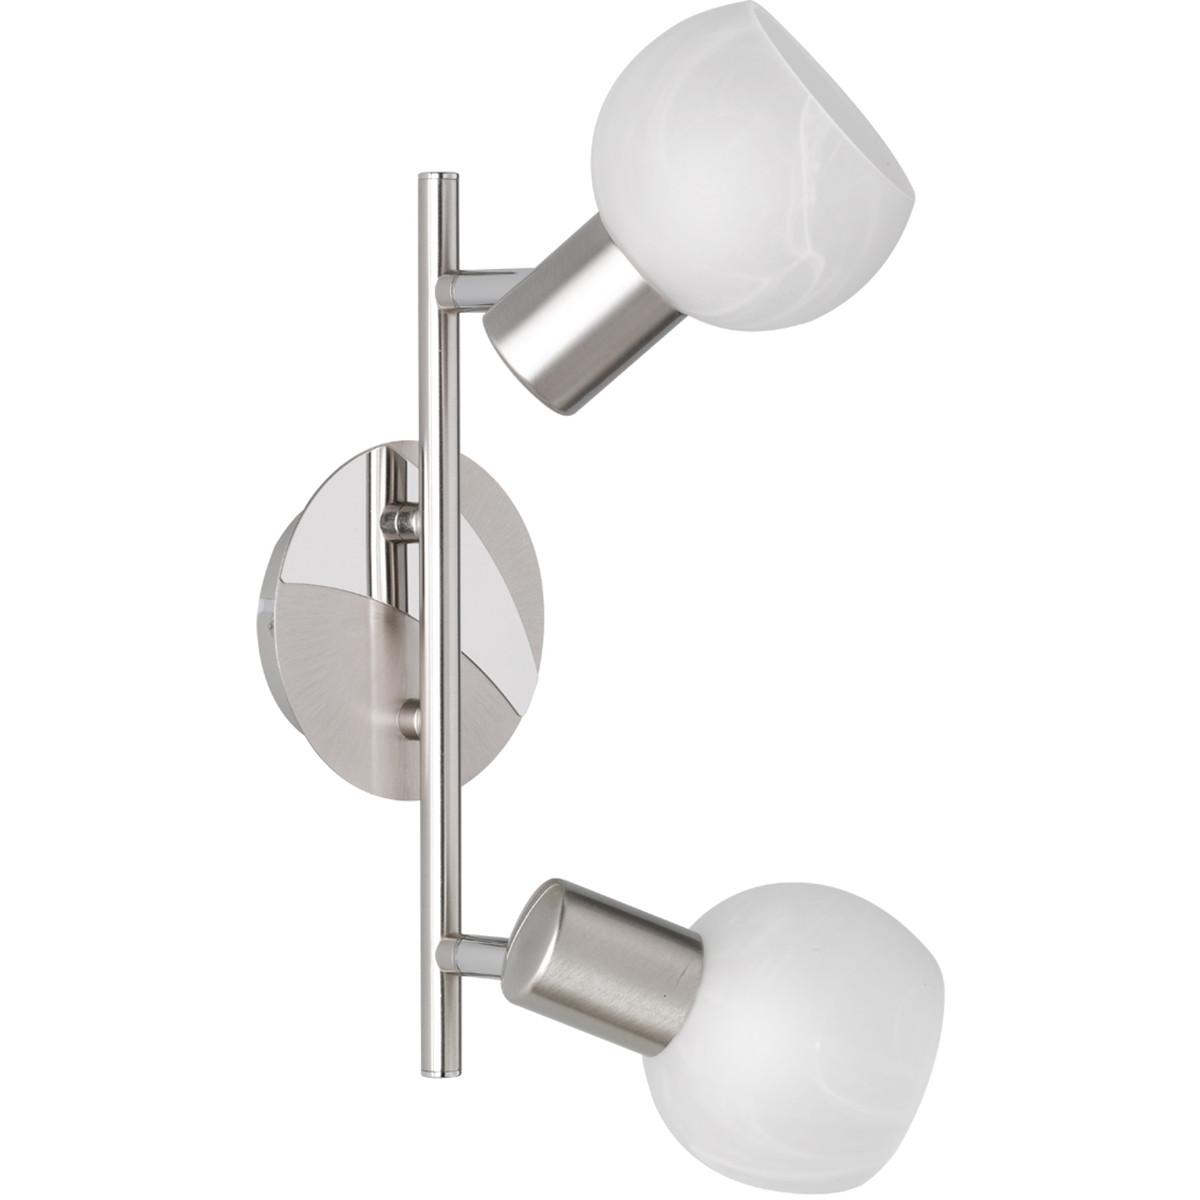 LED Plafondspot - Trion Besina - E14 Fitting - 2-lichts - Rond - Mat Nikkel - Aluminium